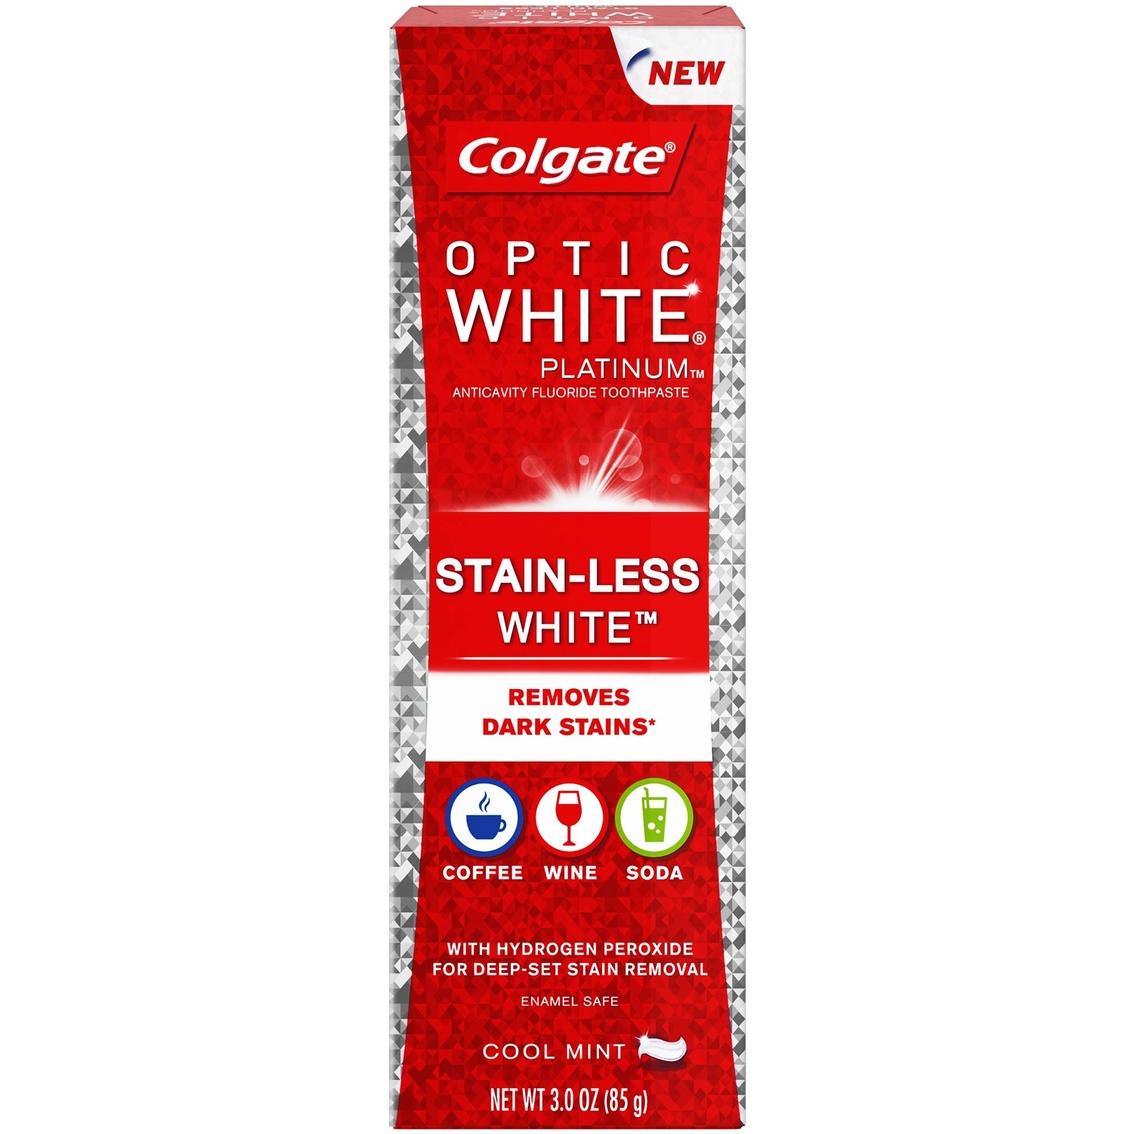 Colgate Optic White Platinum Stain Less White Toothpaste Tooth